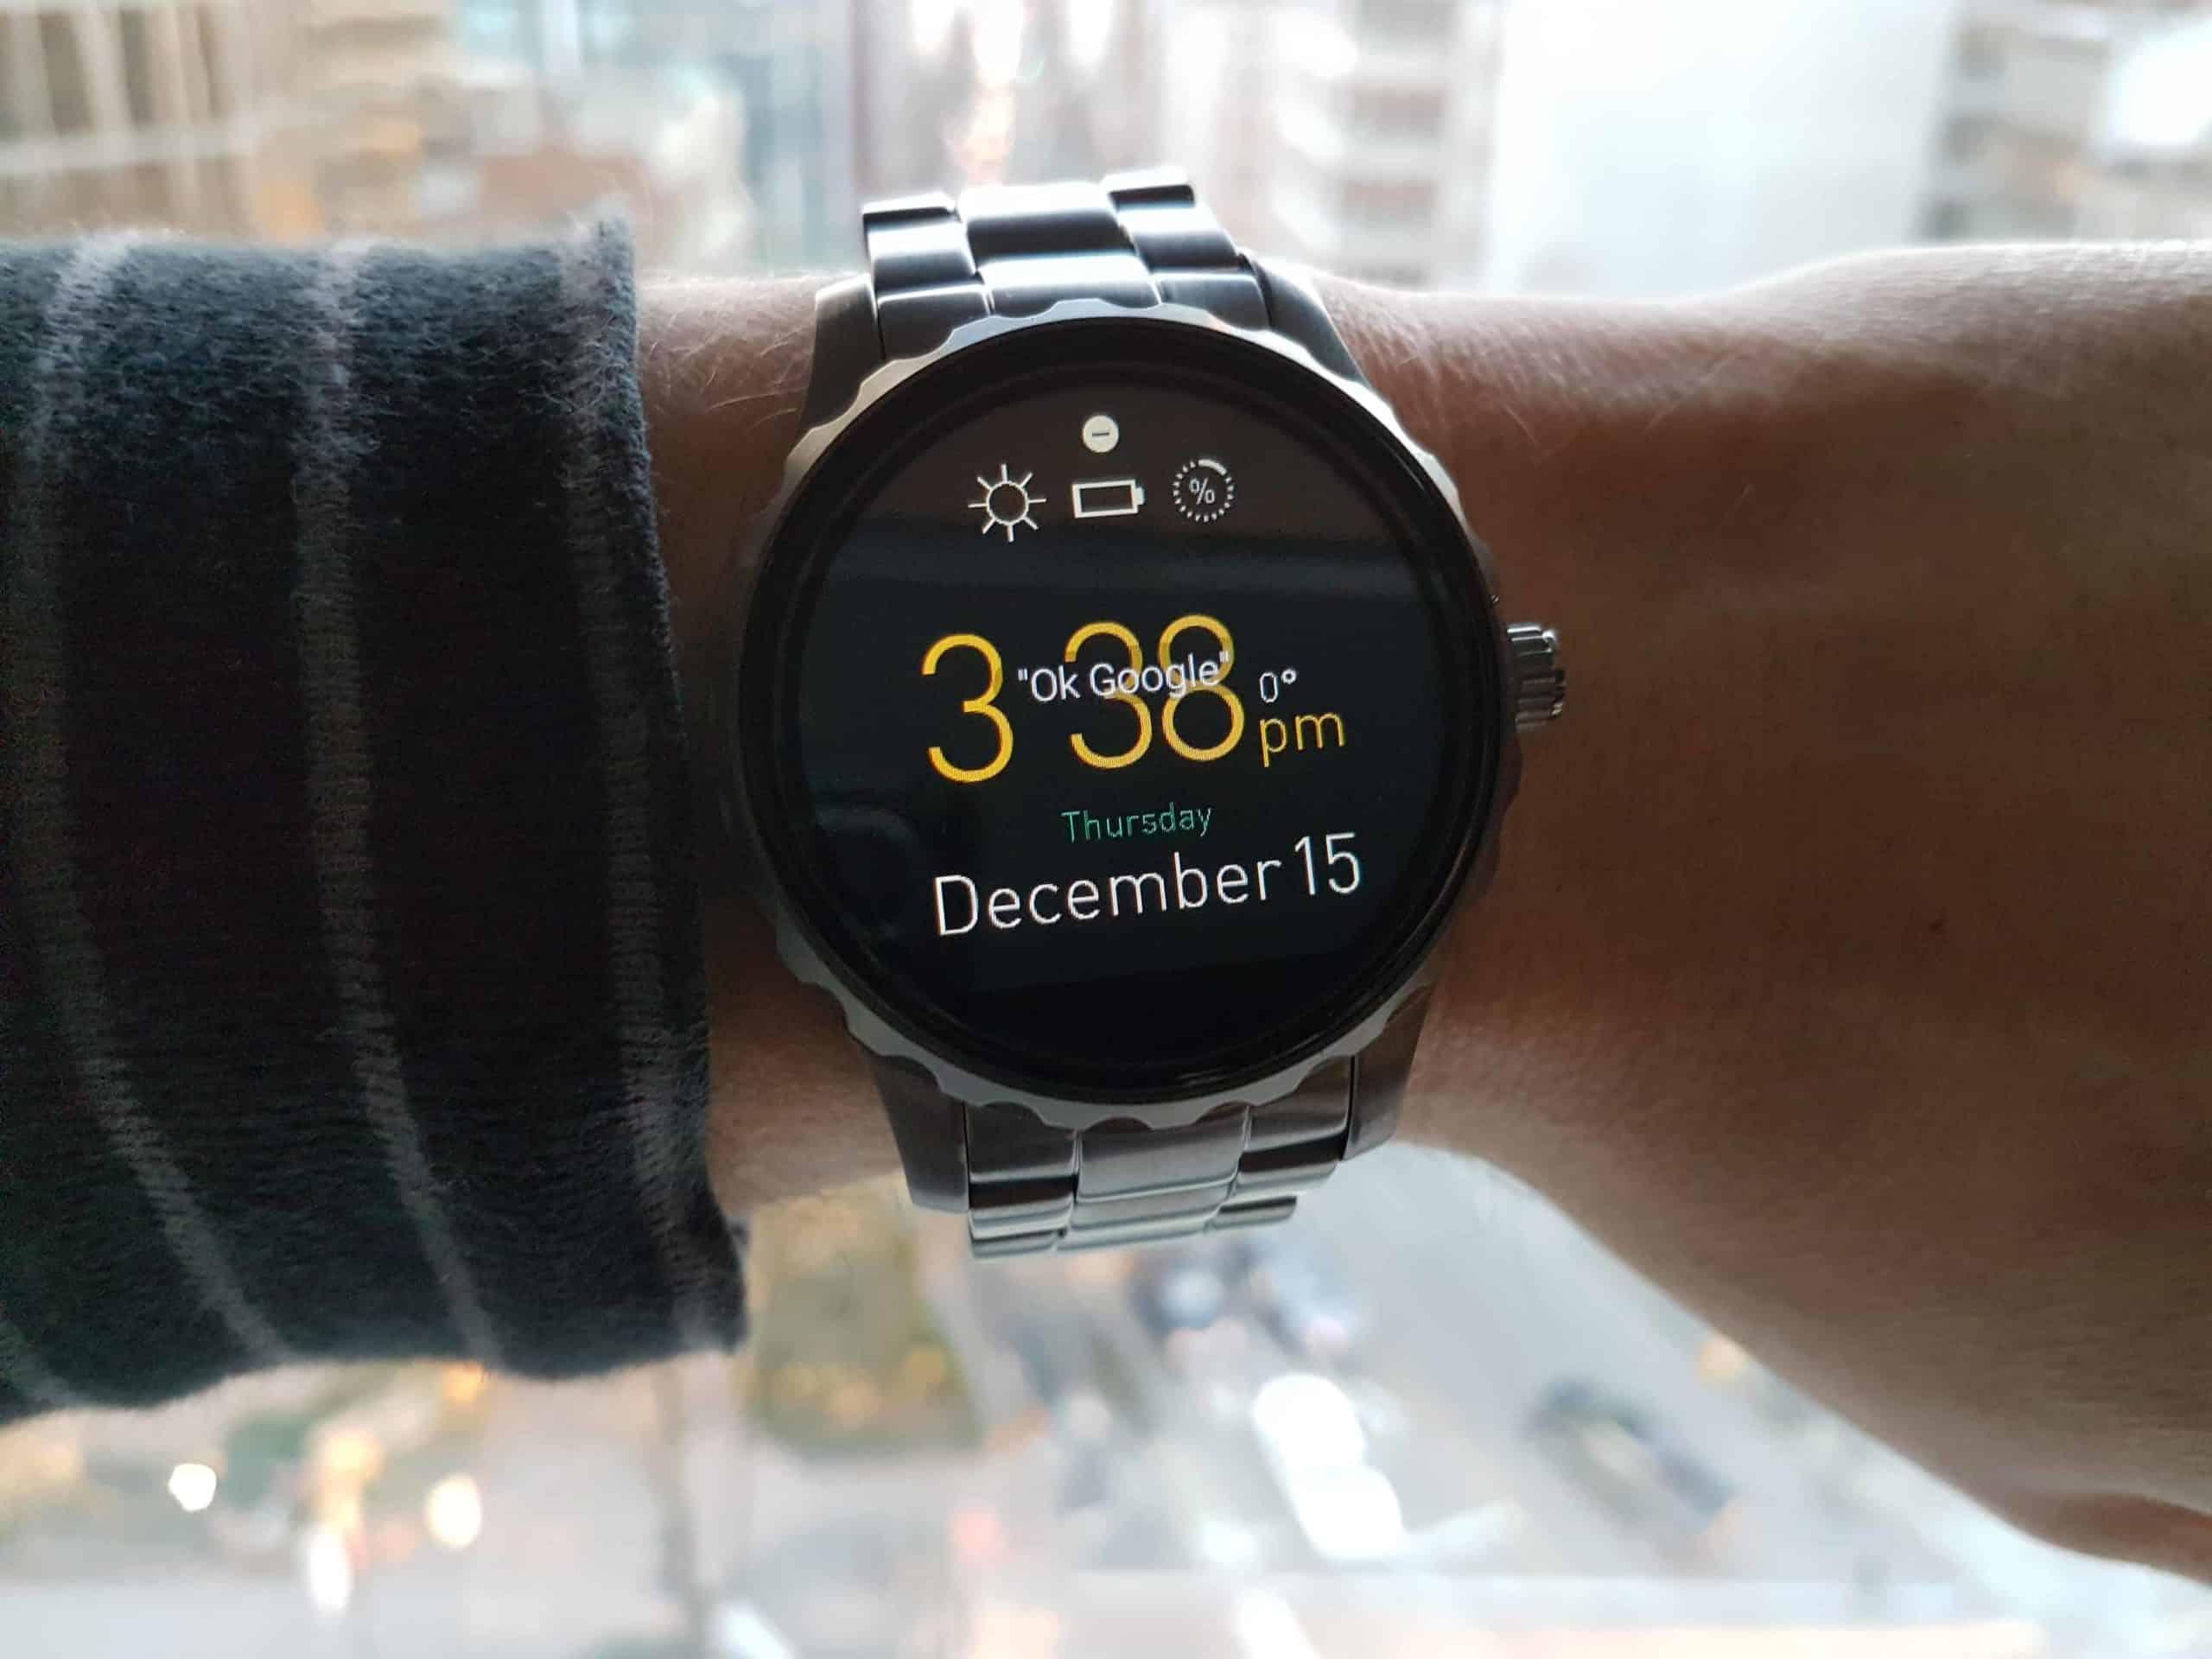 Fossil Q Watch with digital clock.